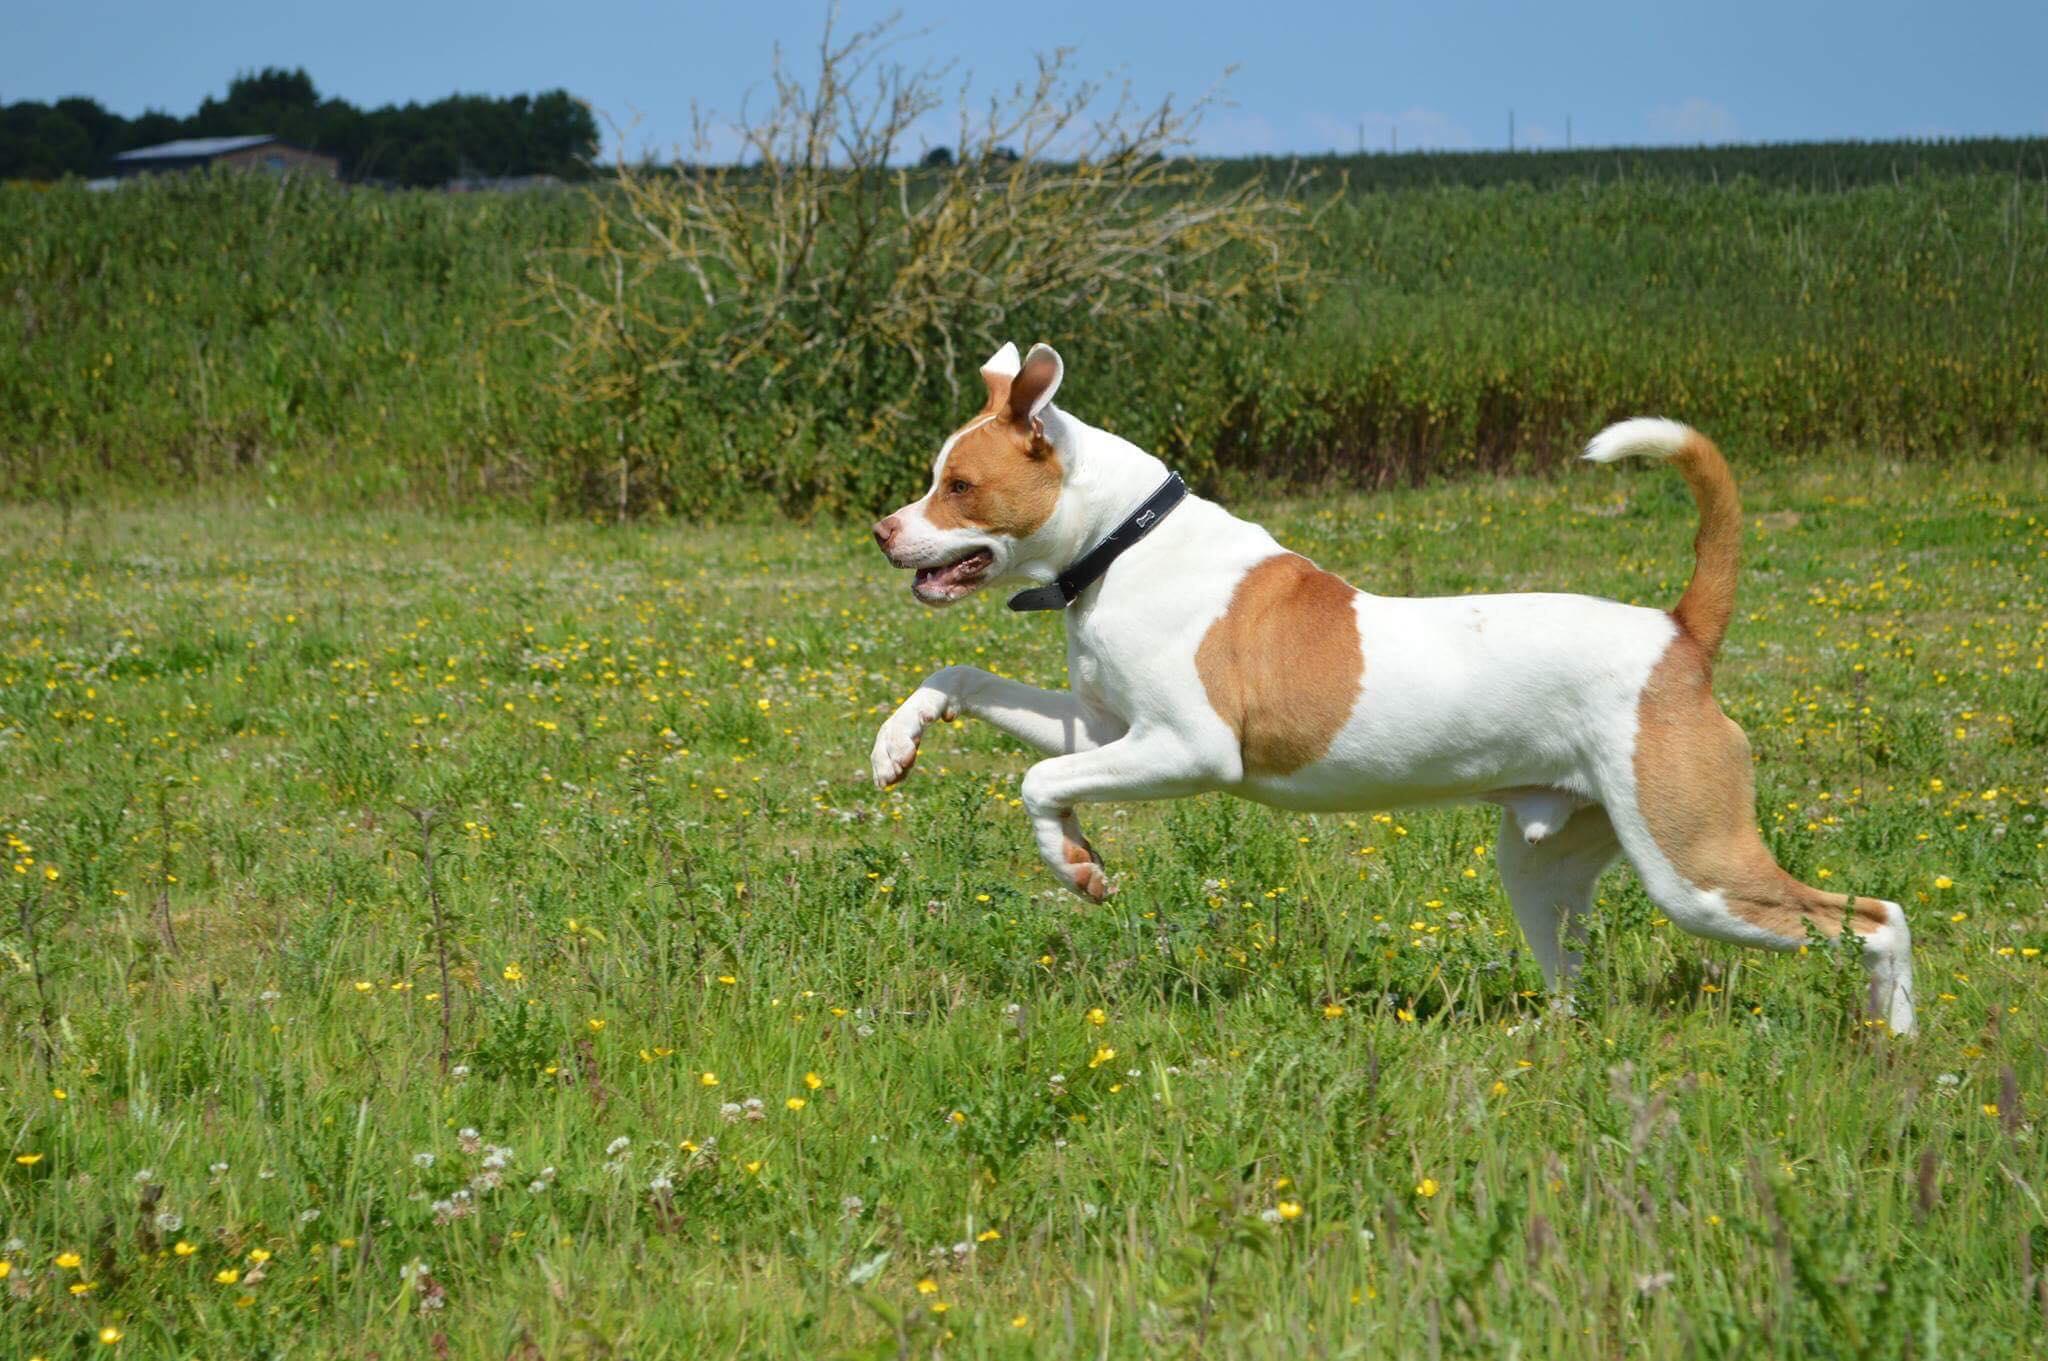 Happy Dog In Field